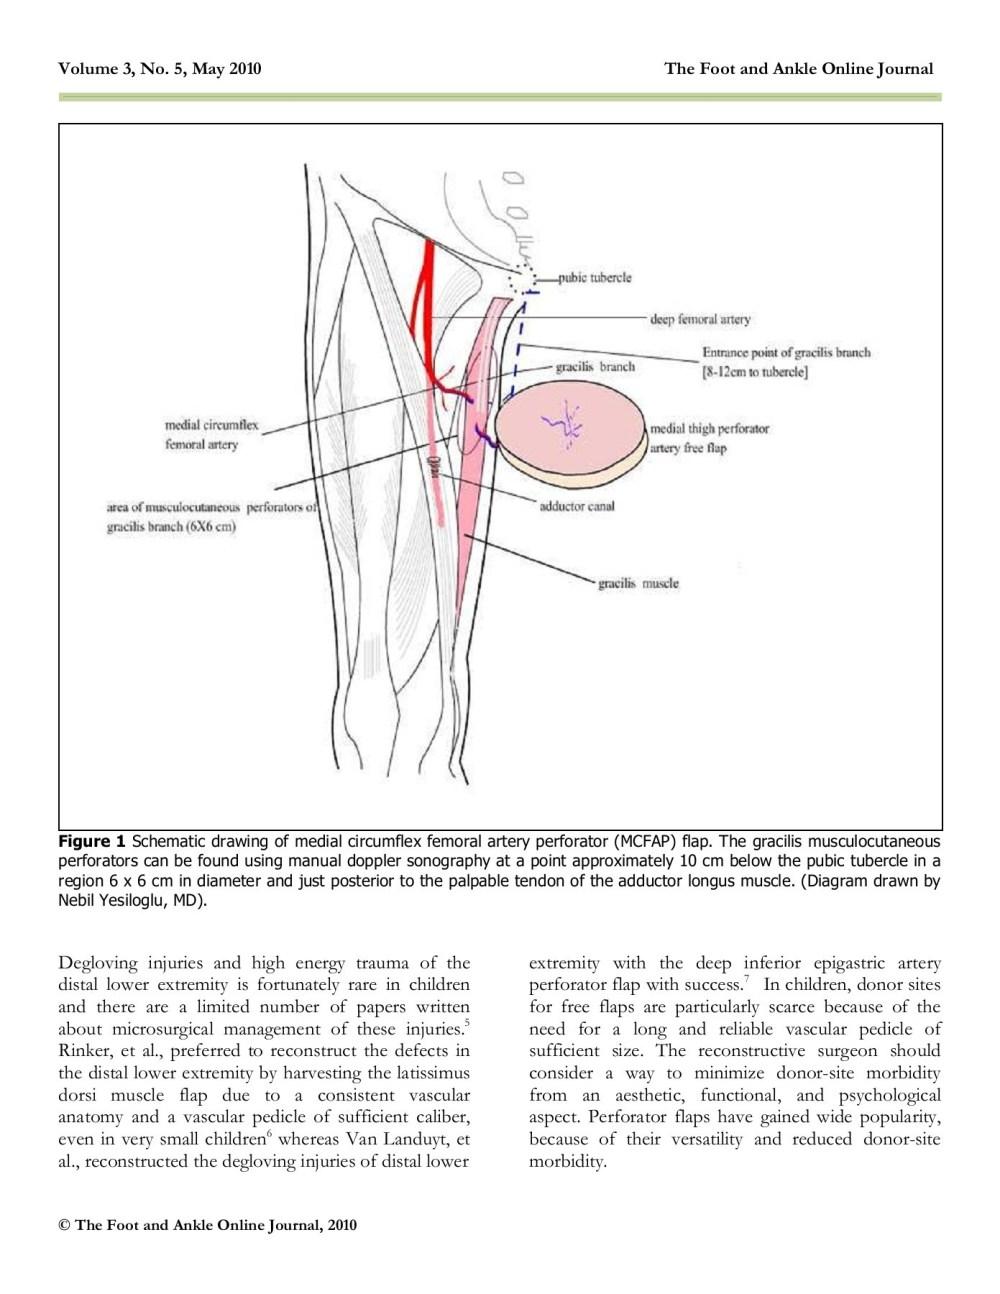 medium resolution of medial circumflex artery flap final wordpress com pages 1 6 text version fliphtml5